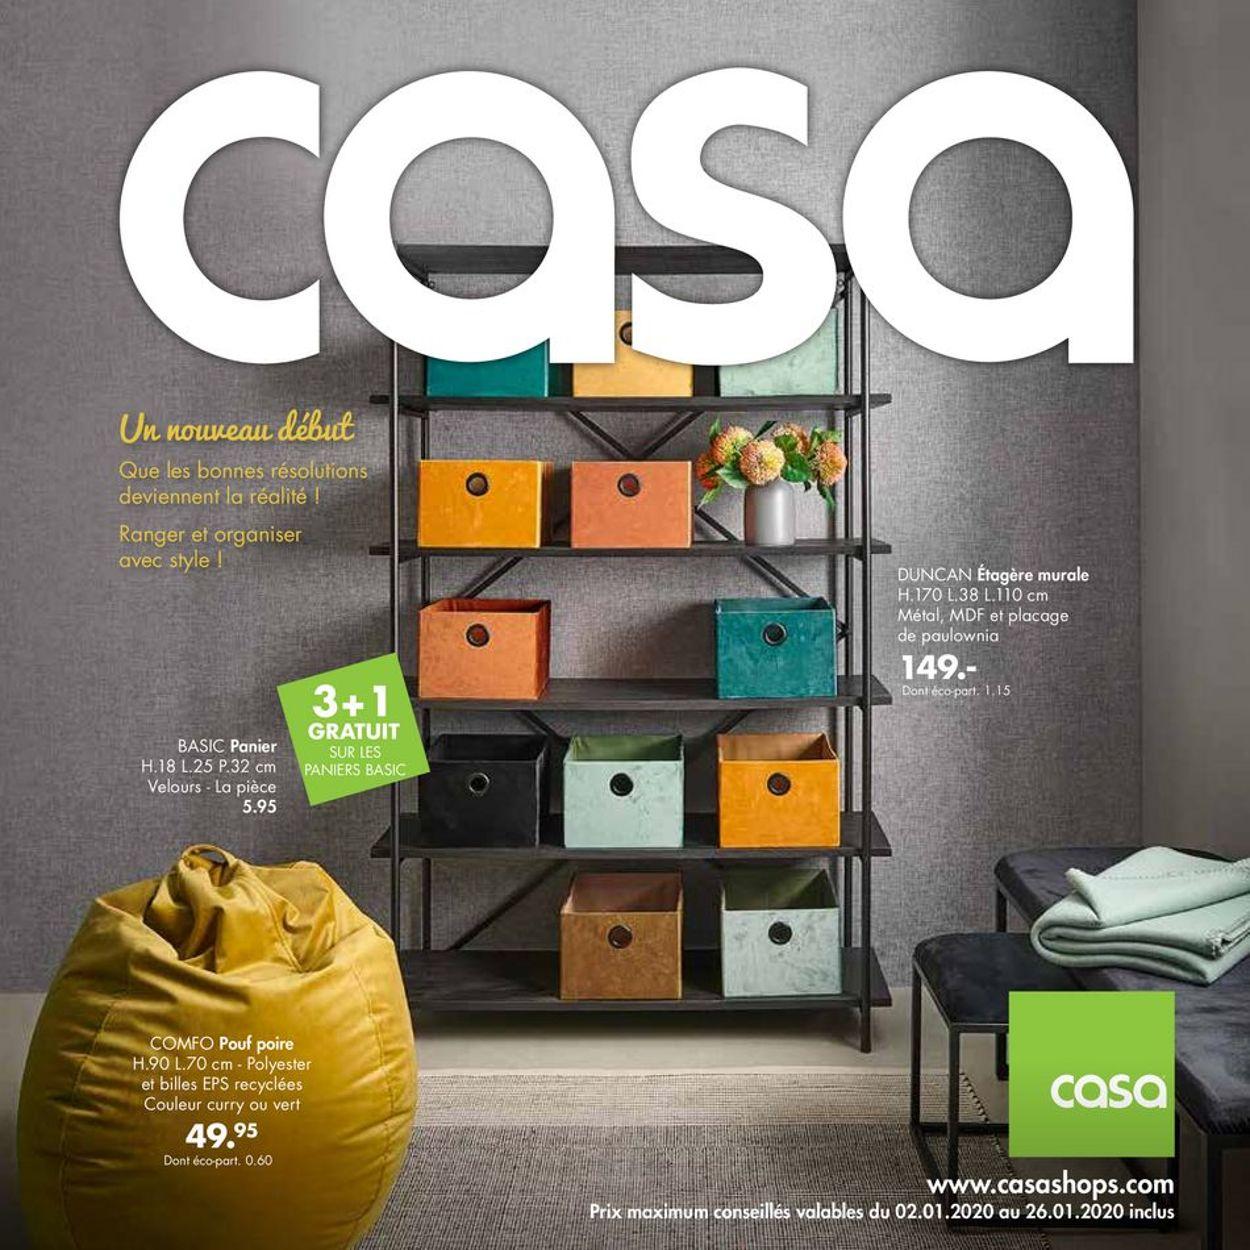 Casa Catalogue - 02.01-26.01.2020